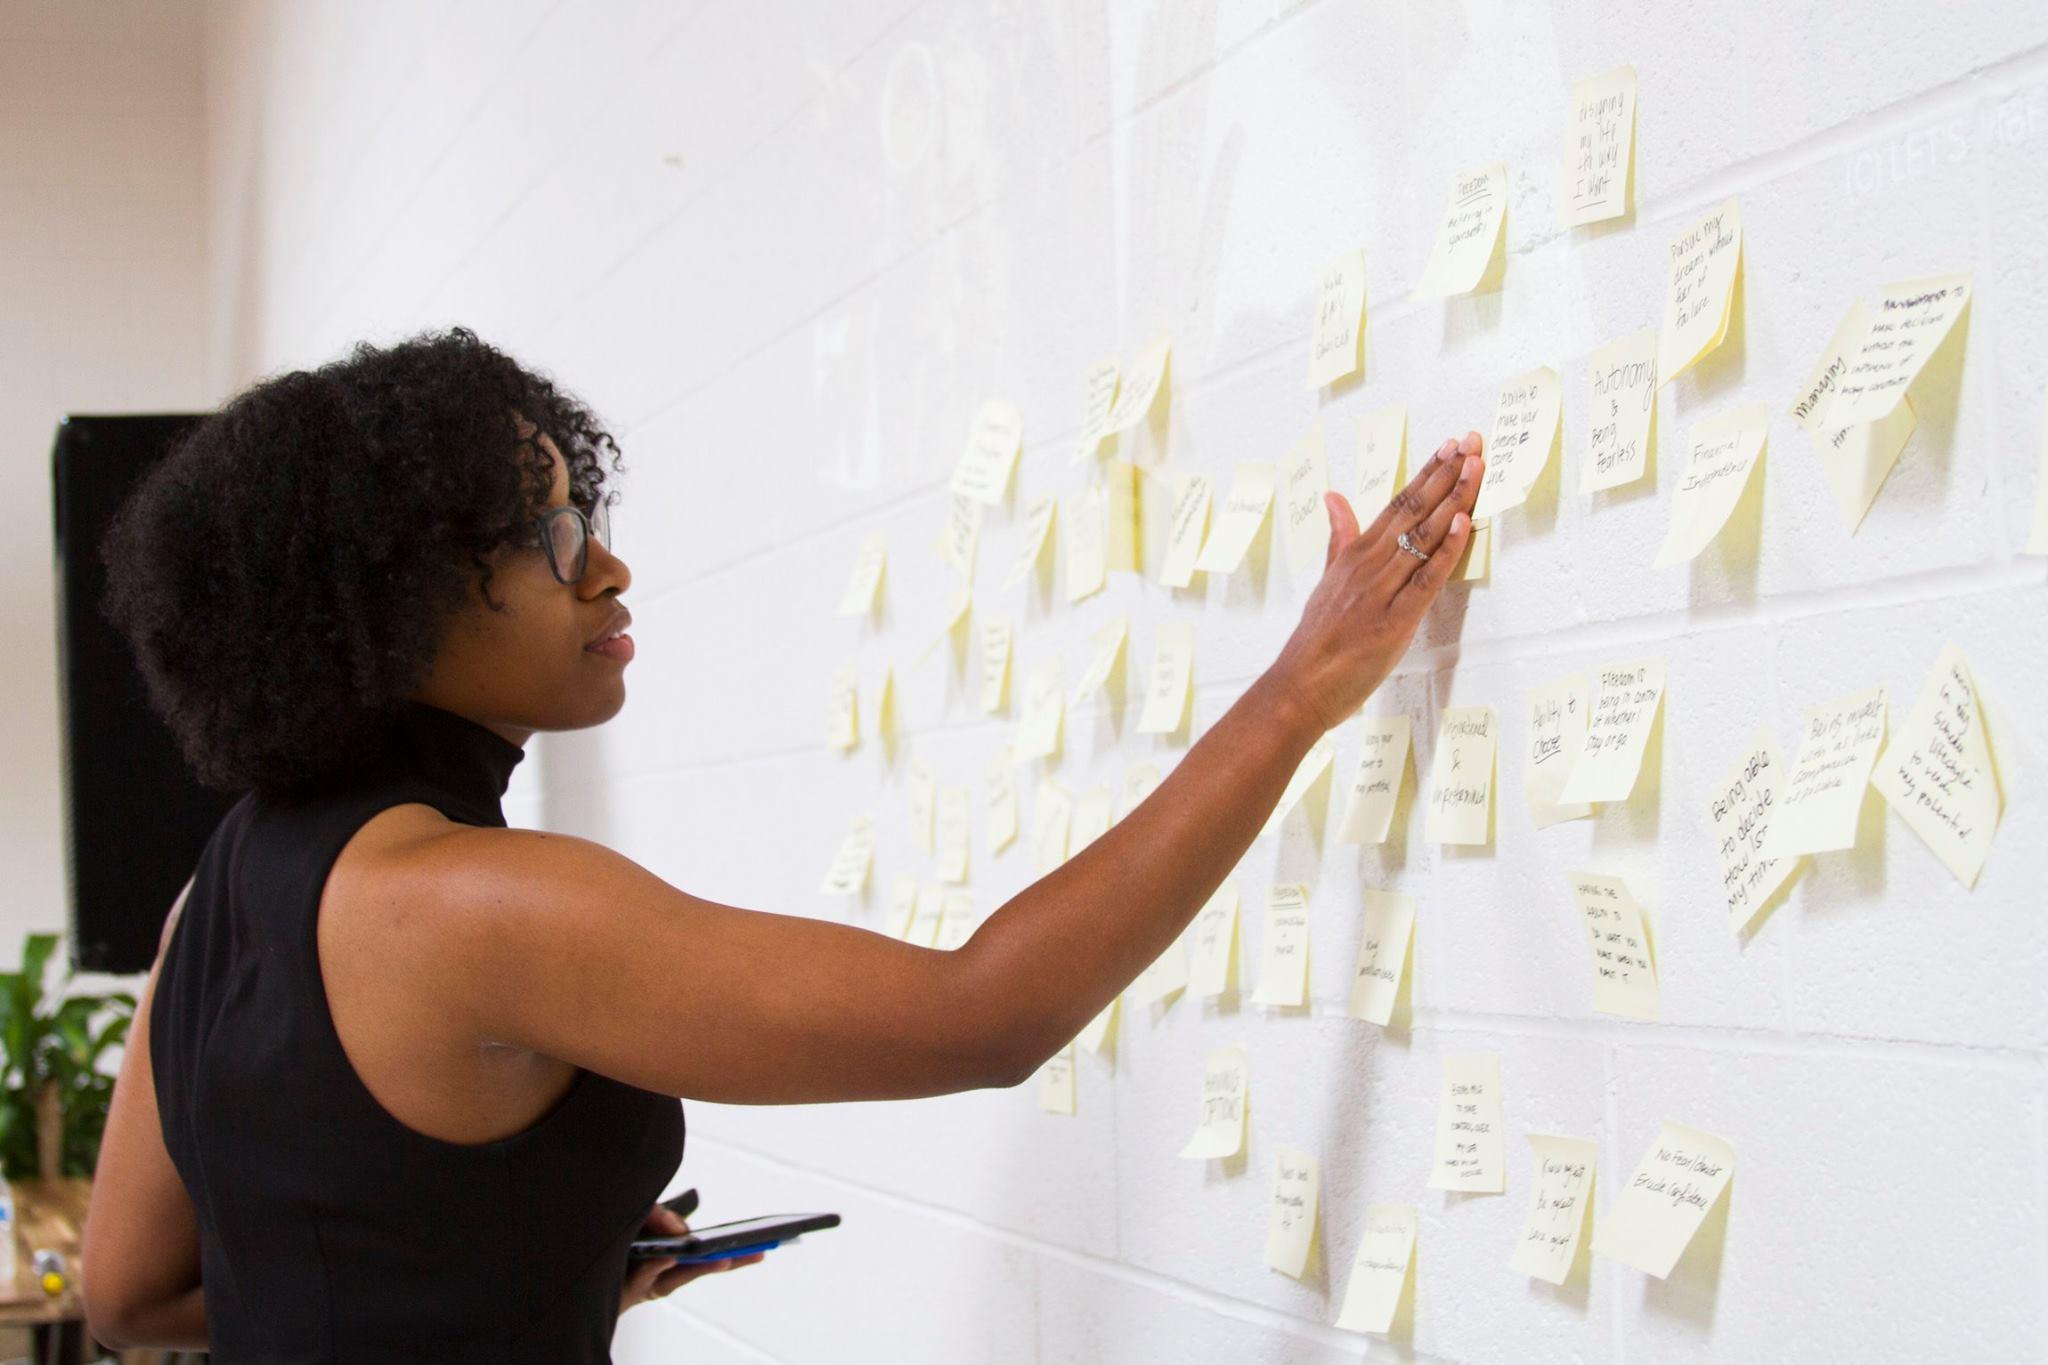 Design Consulting - Strategic Program Design (workshops, cohort programs, conferences & more)Brand DesignService DesignProduct DesignInclusive Pipeline Design